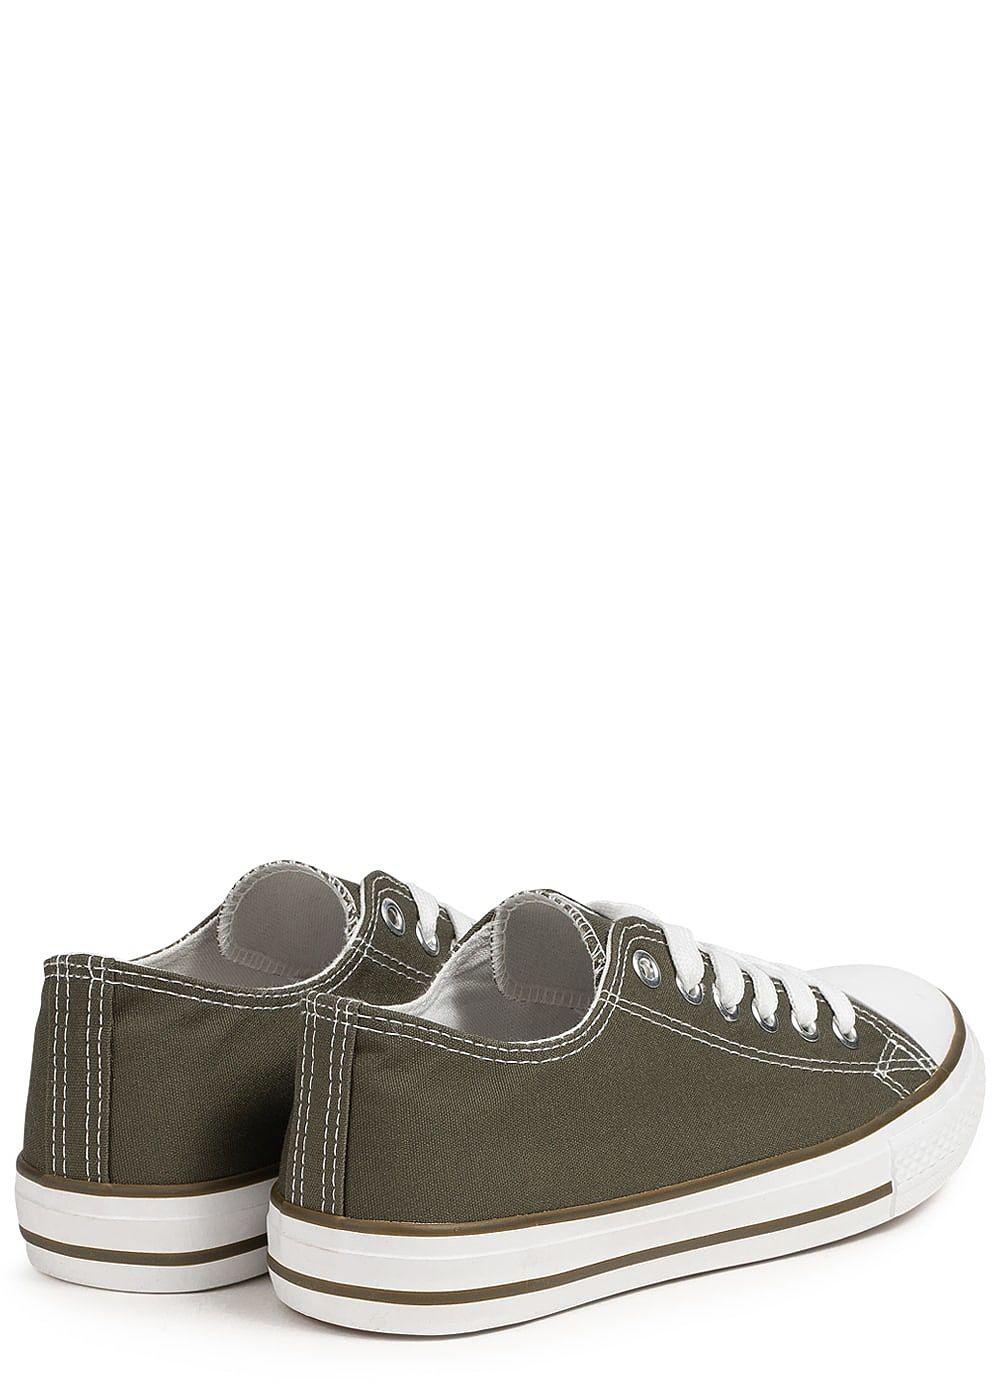 4f05f2e2b4bfb2 Seventyseven Lifestyle Damen Schuh Canvas-Sneaker olive grün ...